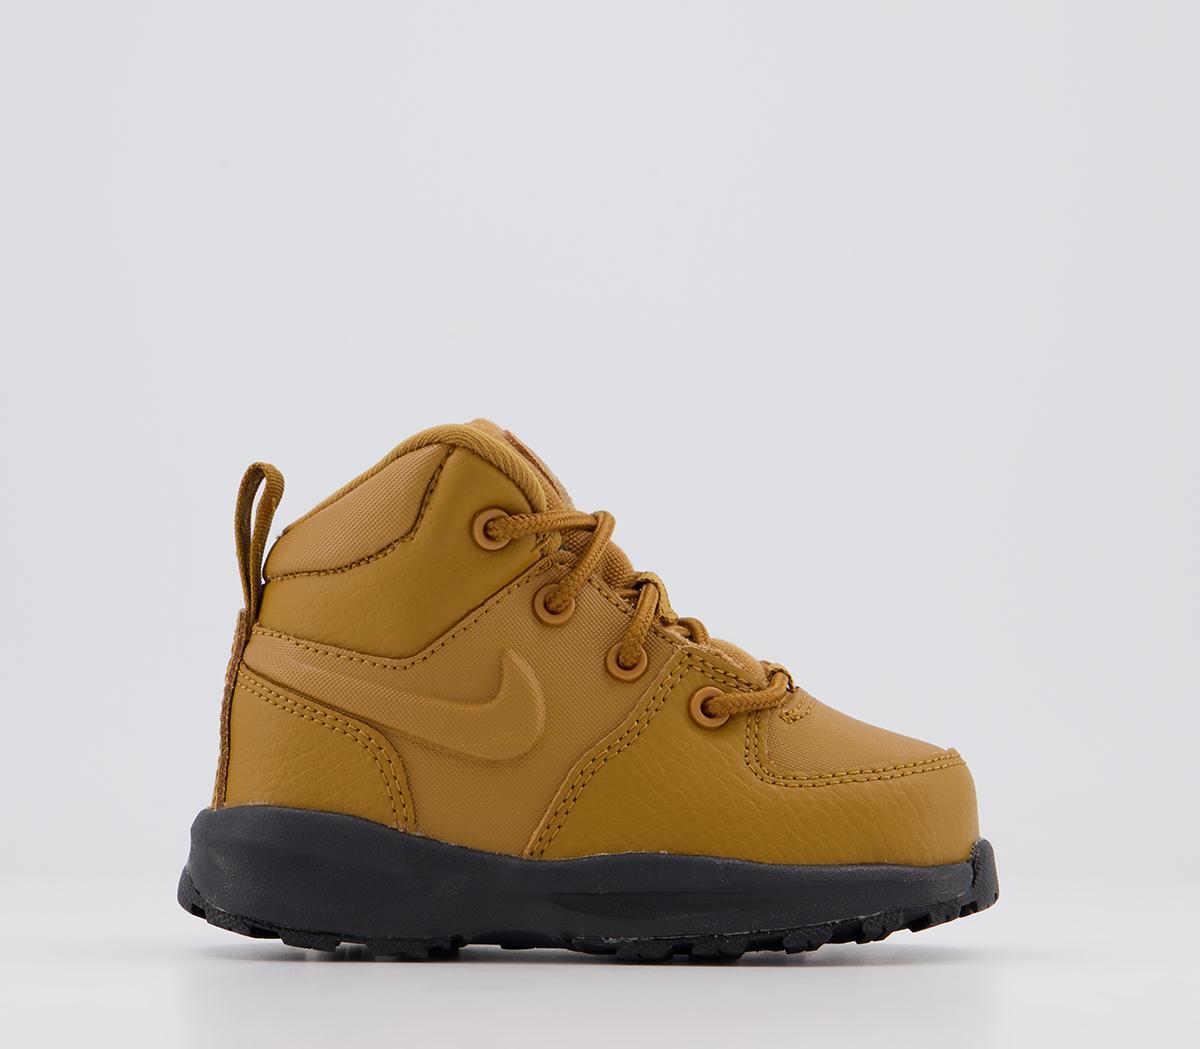 Nike Manoa Infant Boots